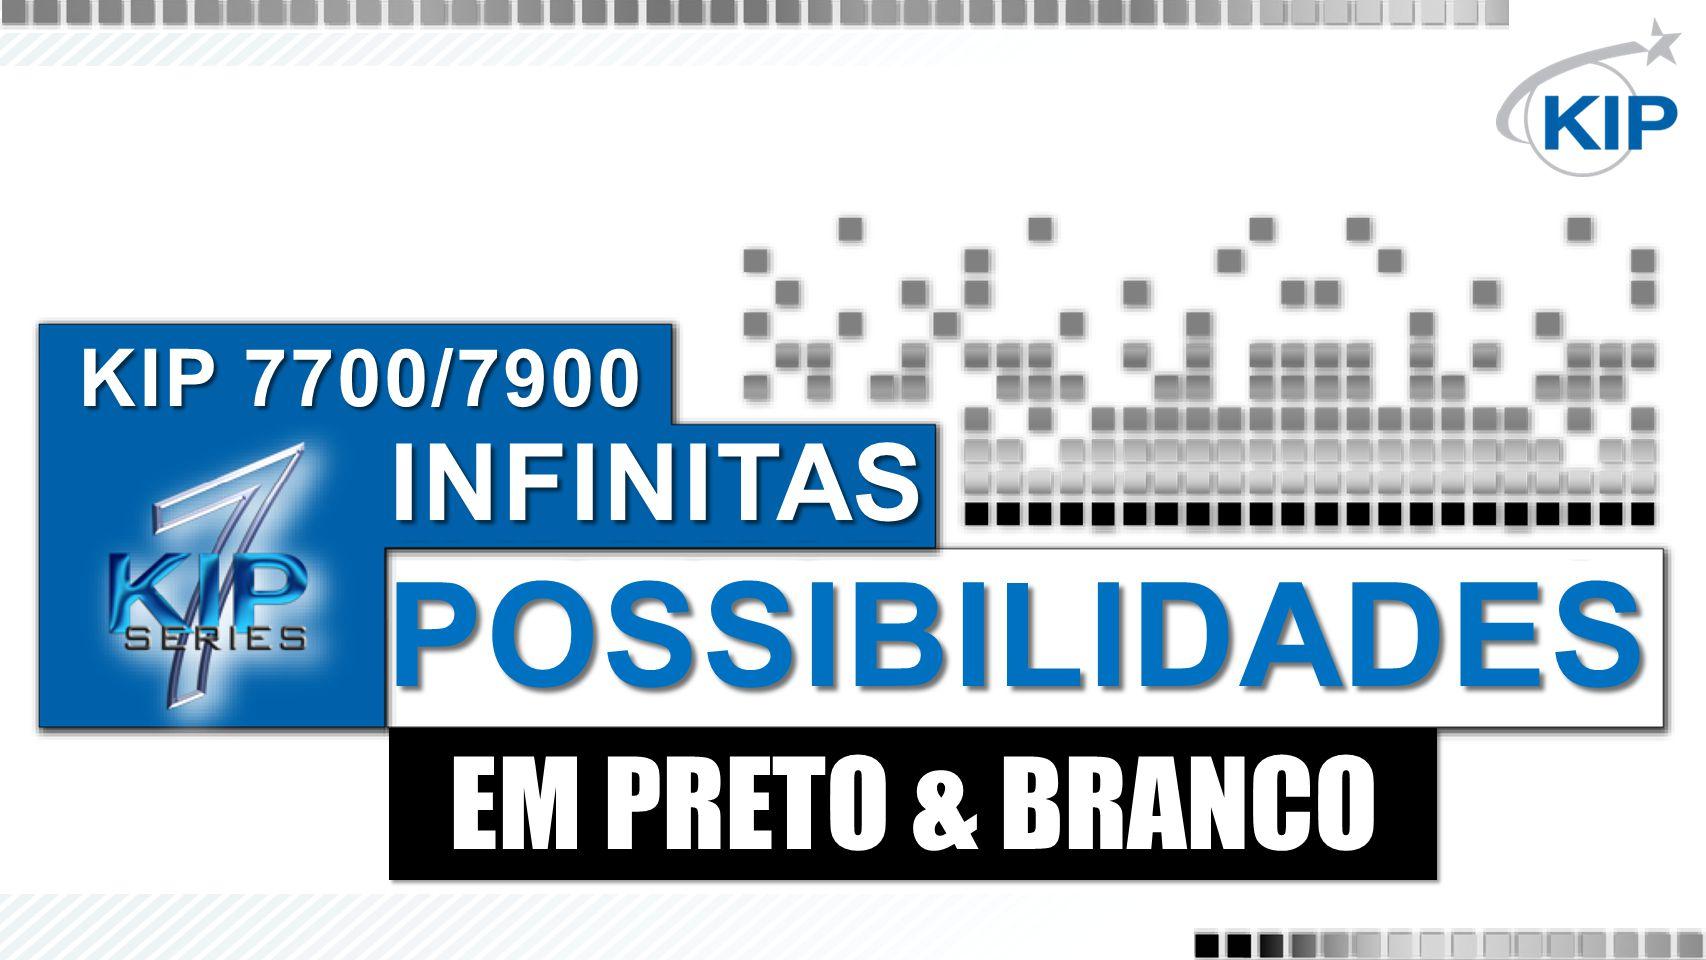 EM PRETO & BRANCO KIP 7700/7900 INFINITAS POSSIBILIDADES